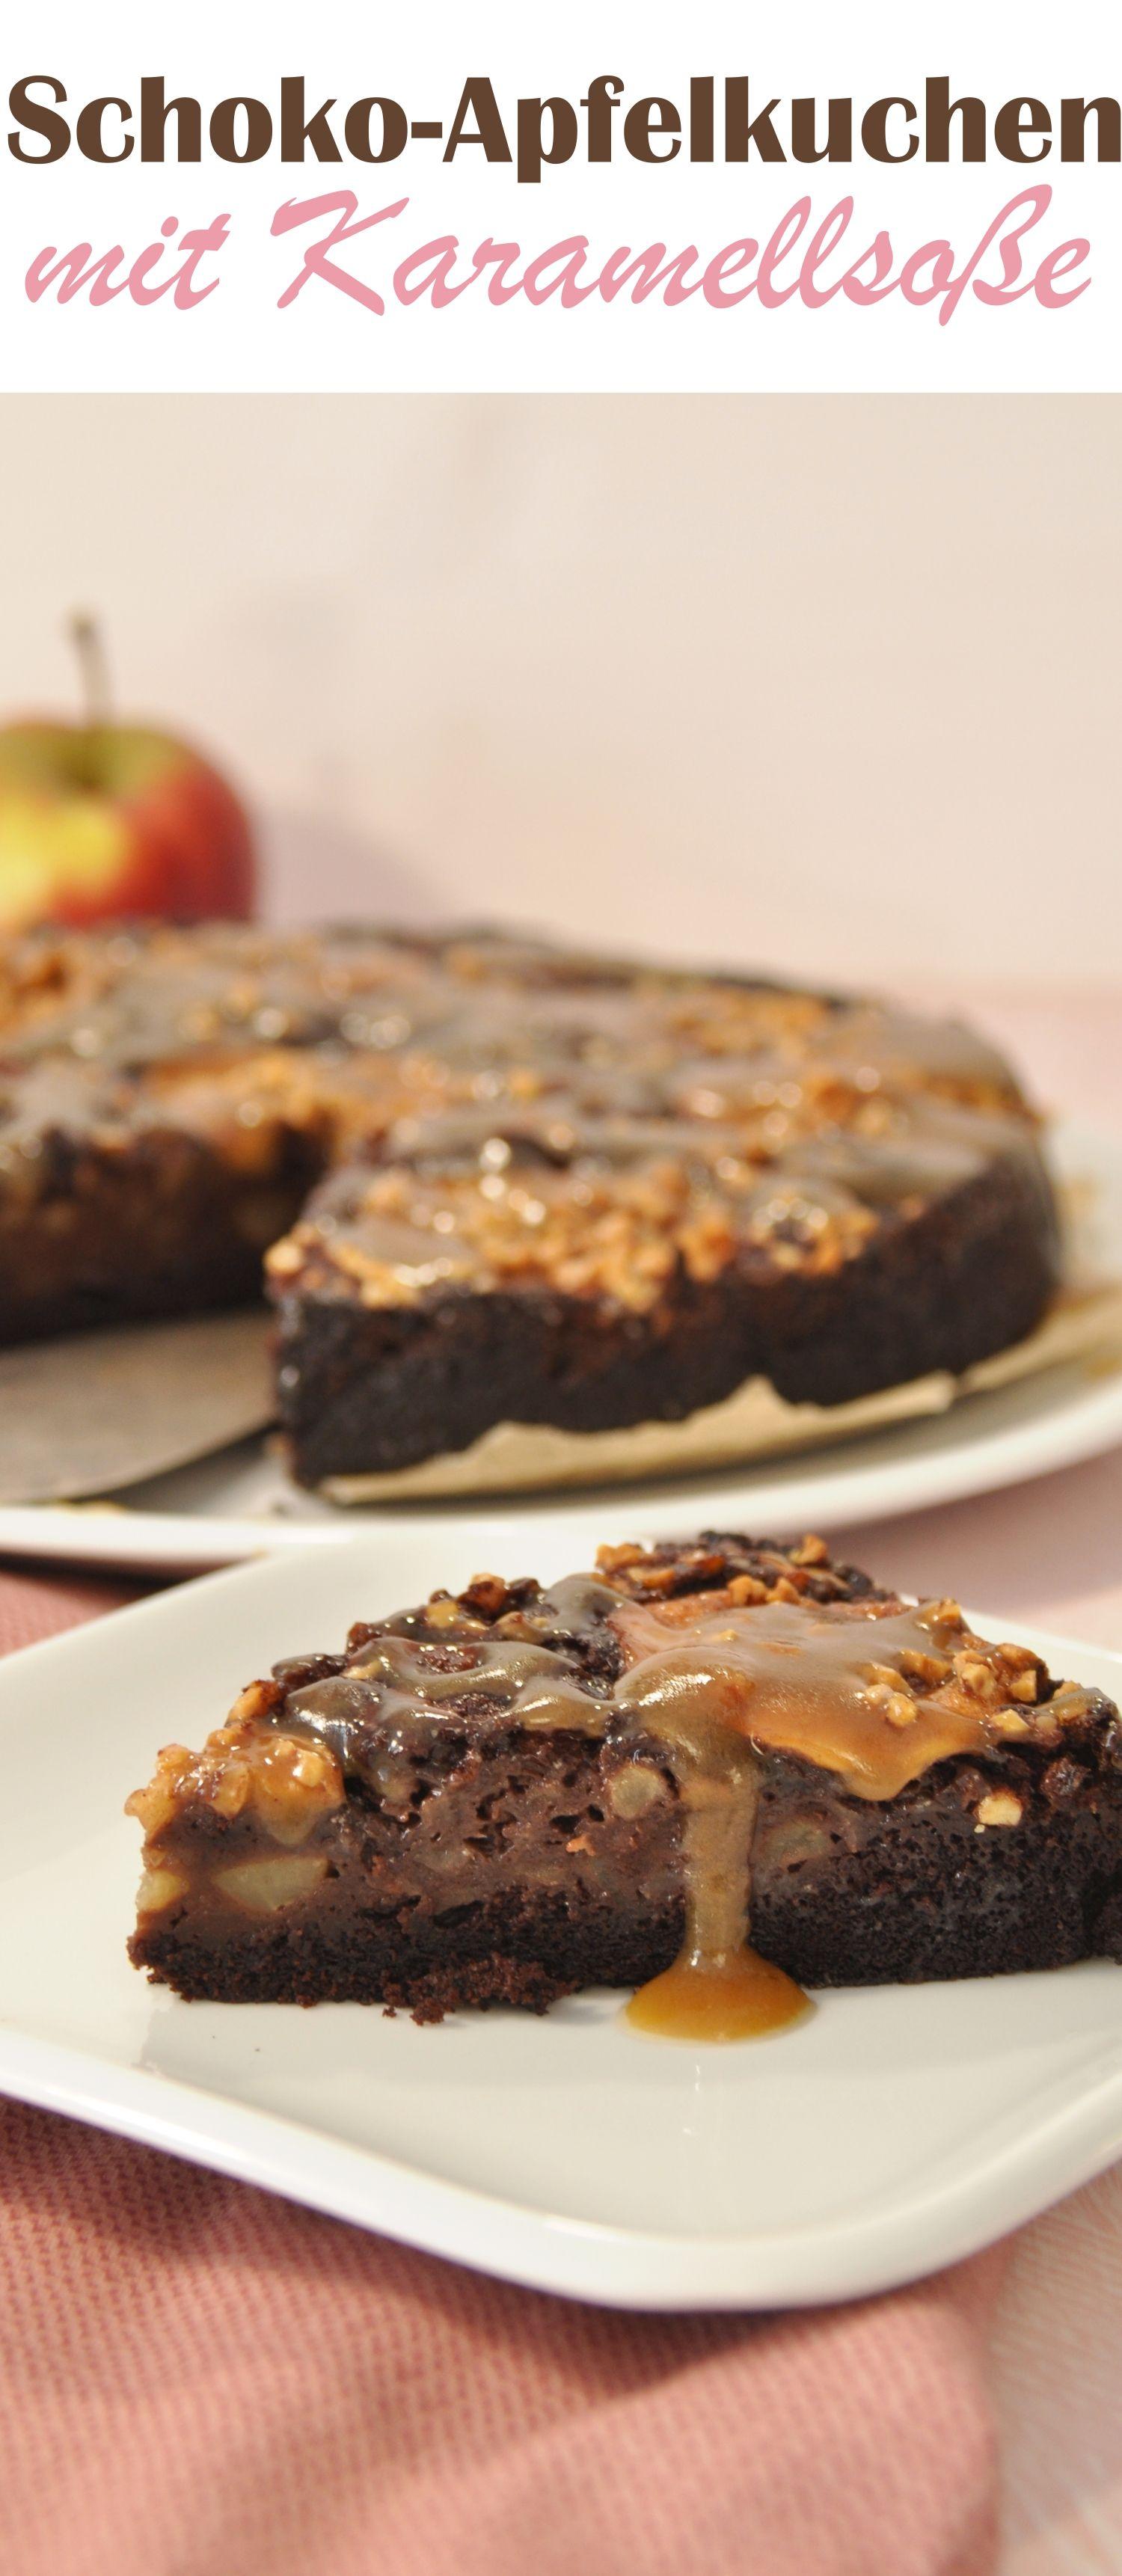 Schoko Apfelkuchen Mit Karamellsosse Kuchen Apfel Schoko Kuchen Und Vegane Kuchenrezepte